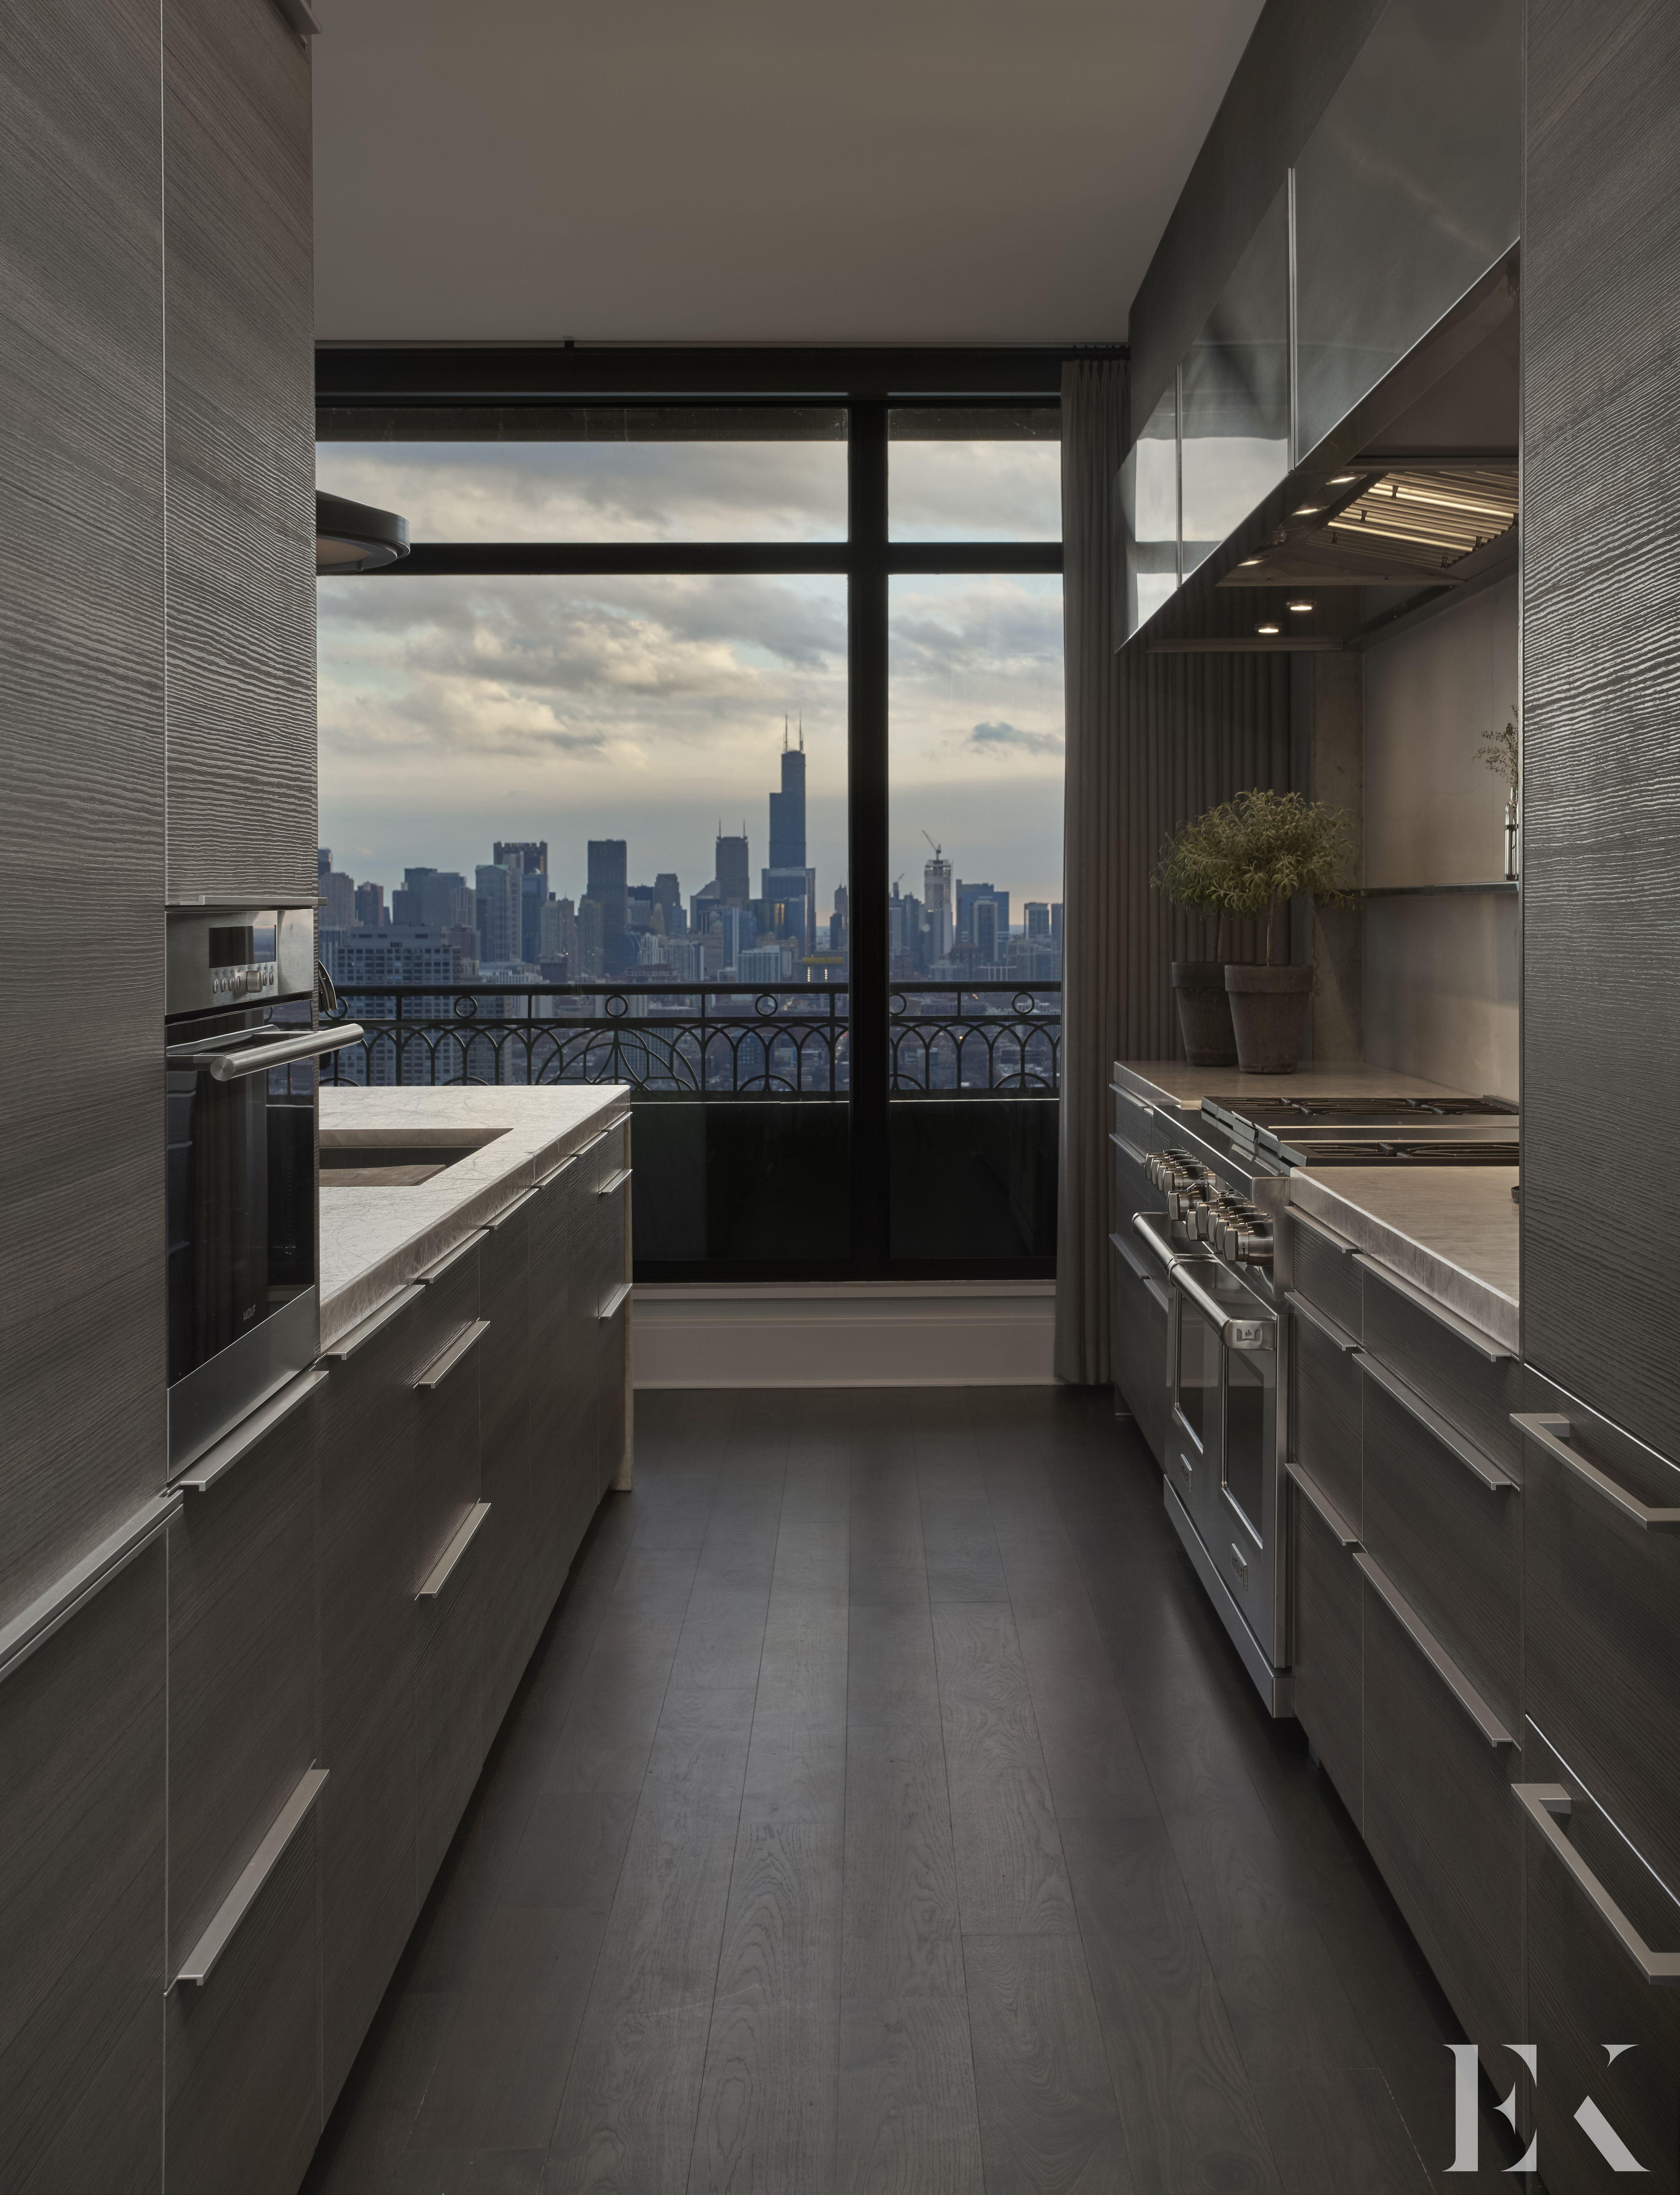 Ekd Chicago Lakefront Luxury Apartment Apartment View Apartment Aesthetic Lakeview Apartments